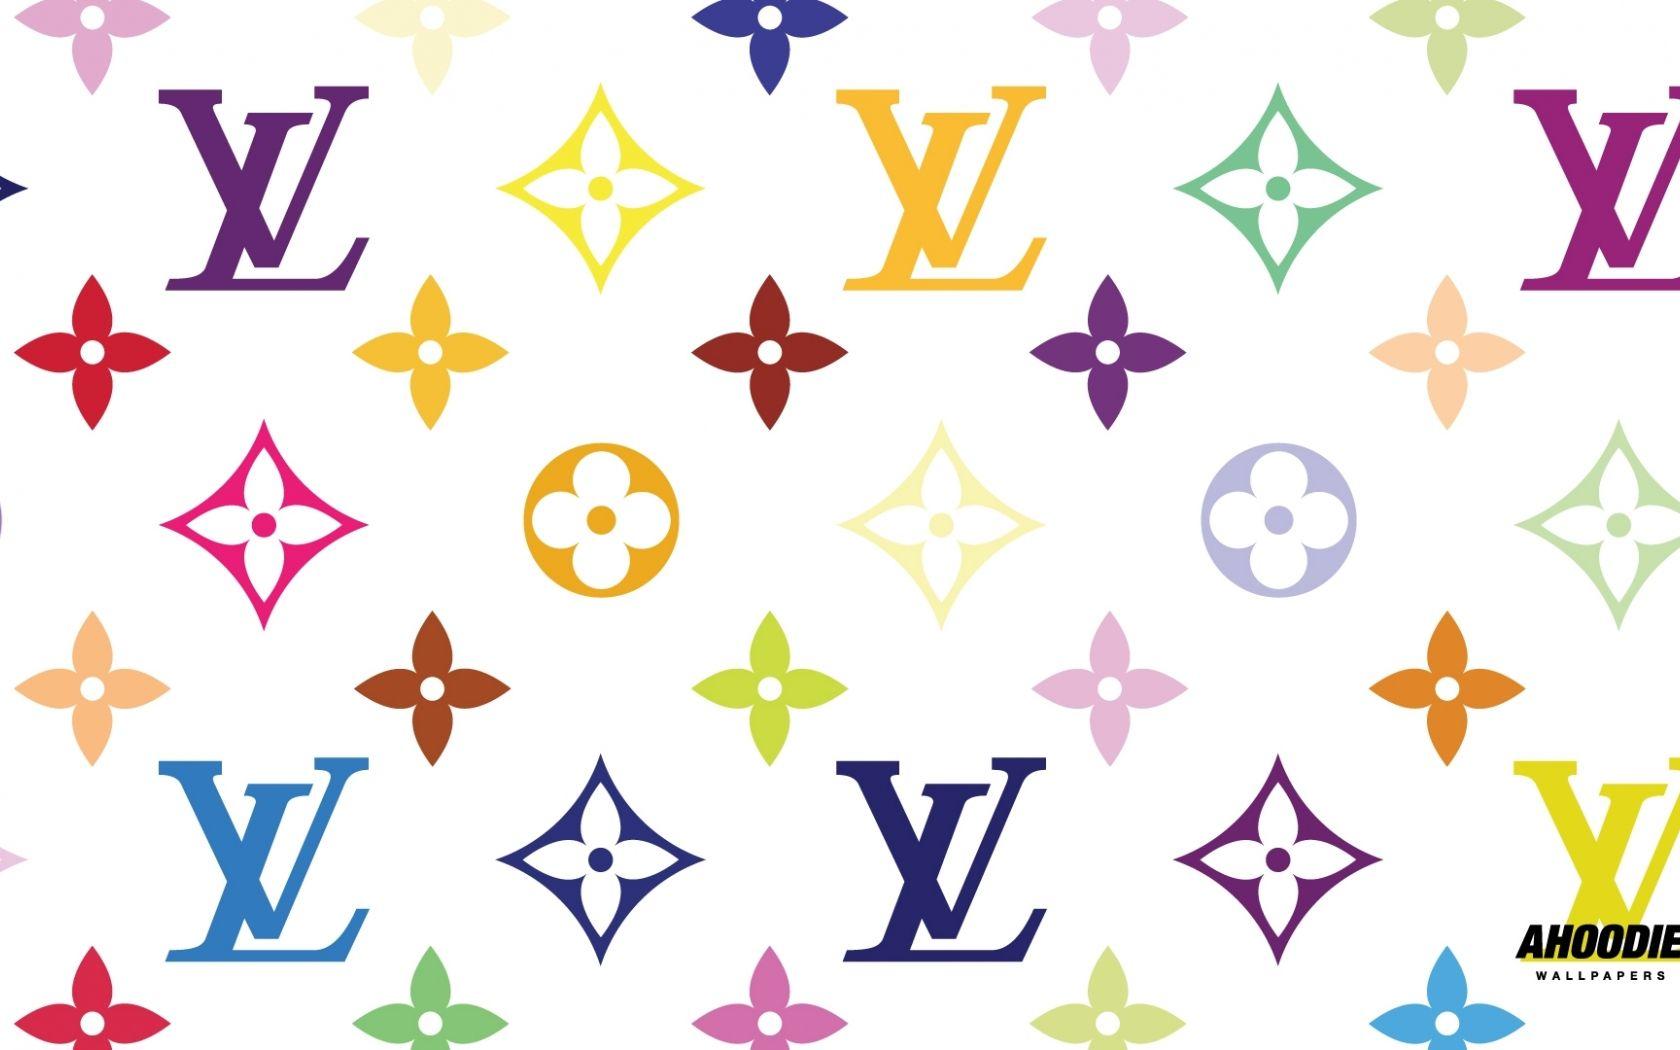 Louis Vuitton Wallpapers On Wallpaperdog